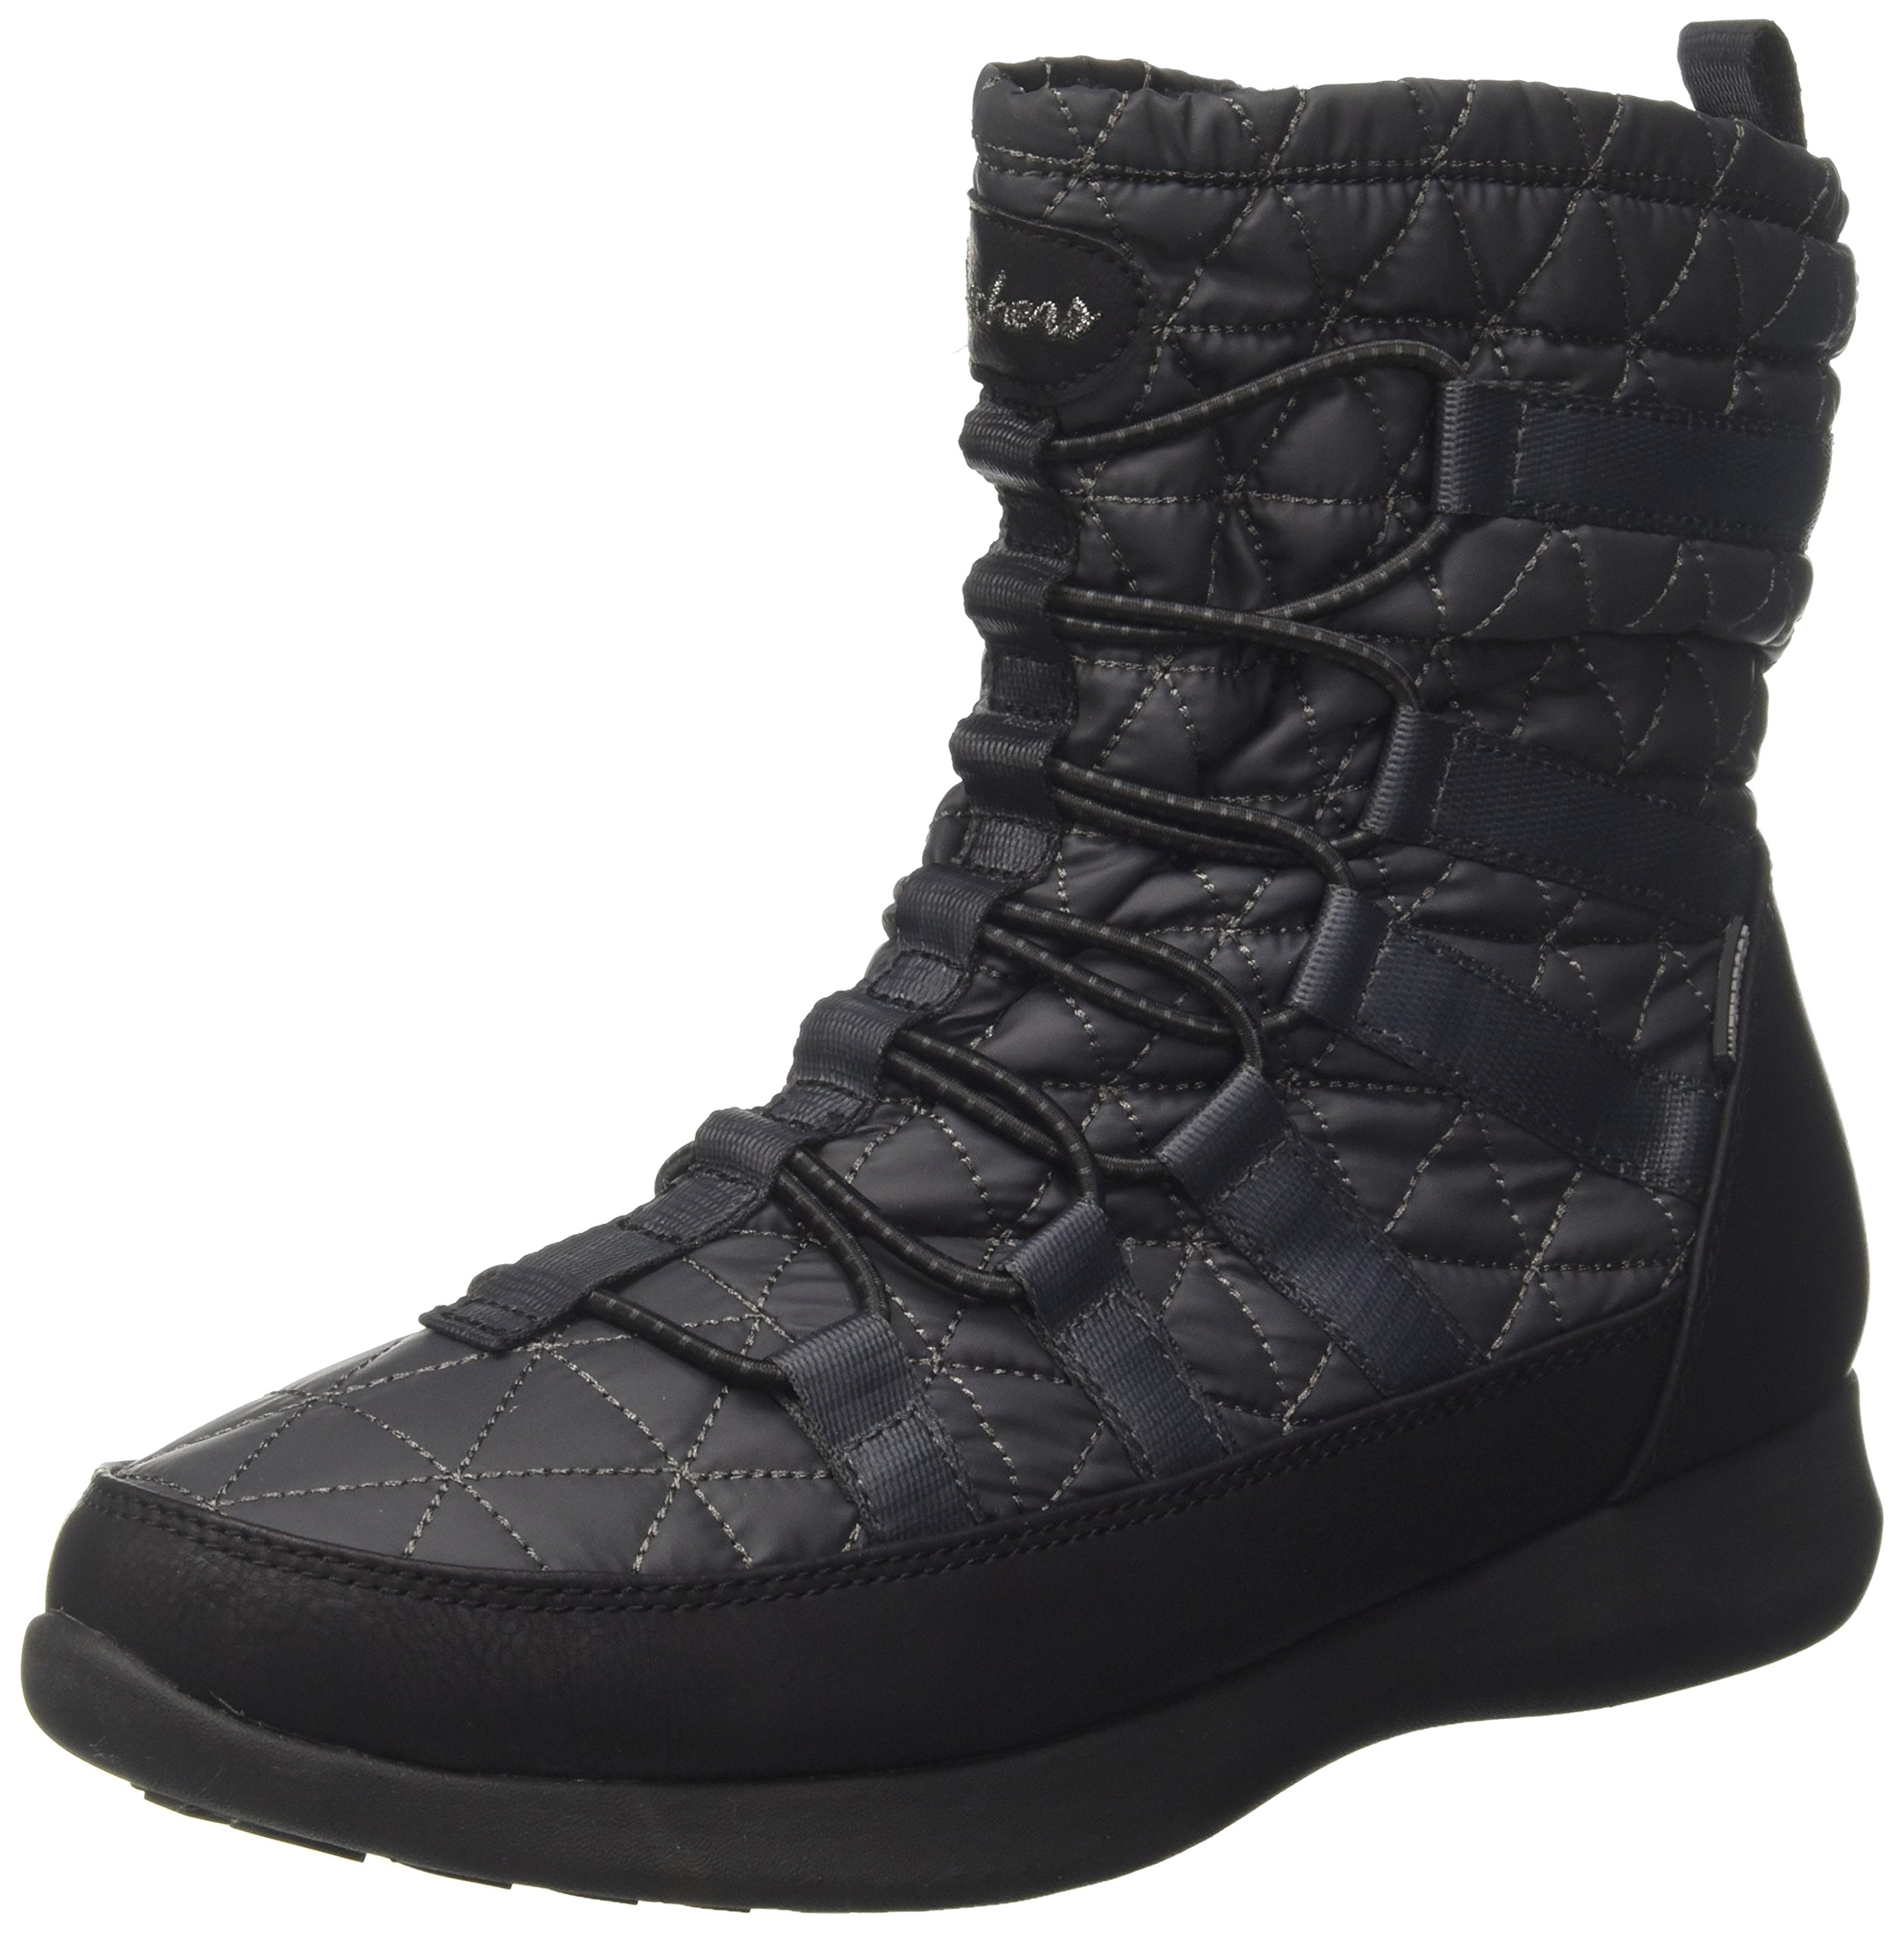 Skechers Women's Boulder Snow Boot,Charcoal/Black,8